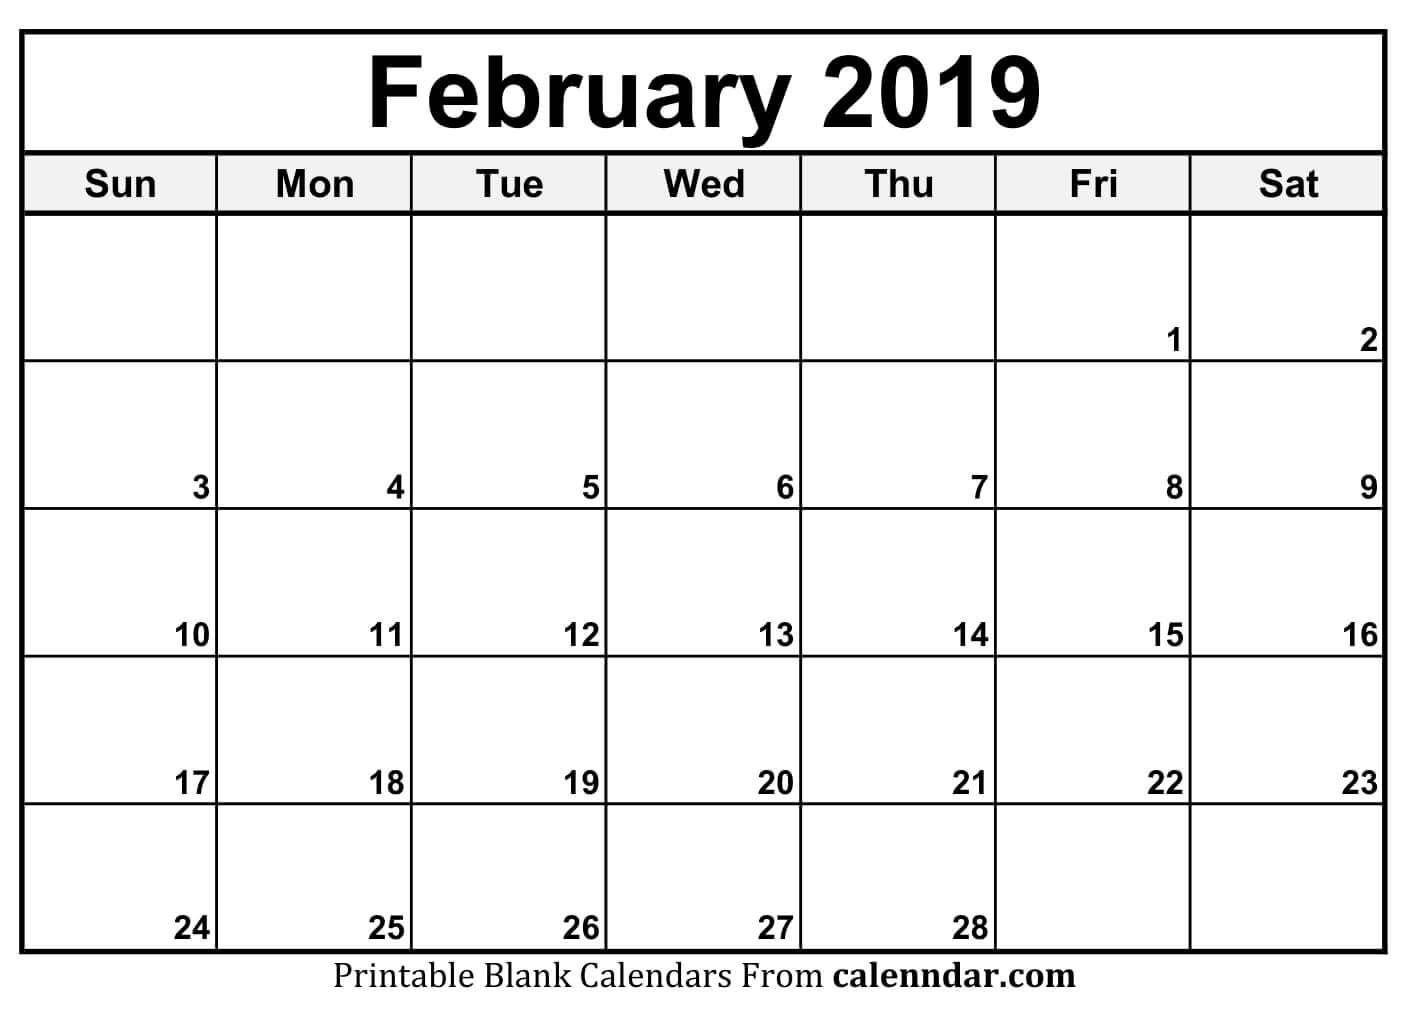 Calendar For 2019 Nz | May 2018 Calendar Nz 2018 Calendar Nz 2019 Calendar Nz